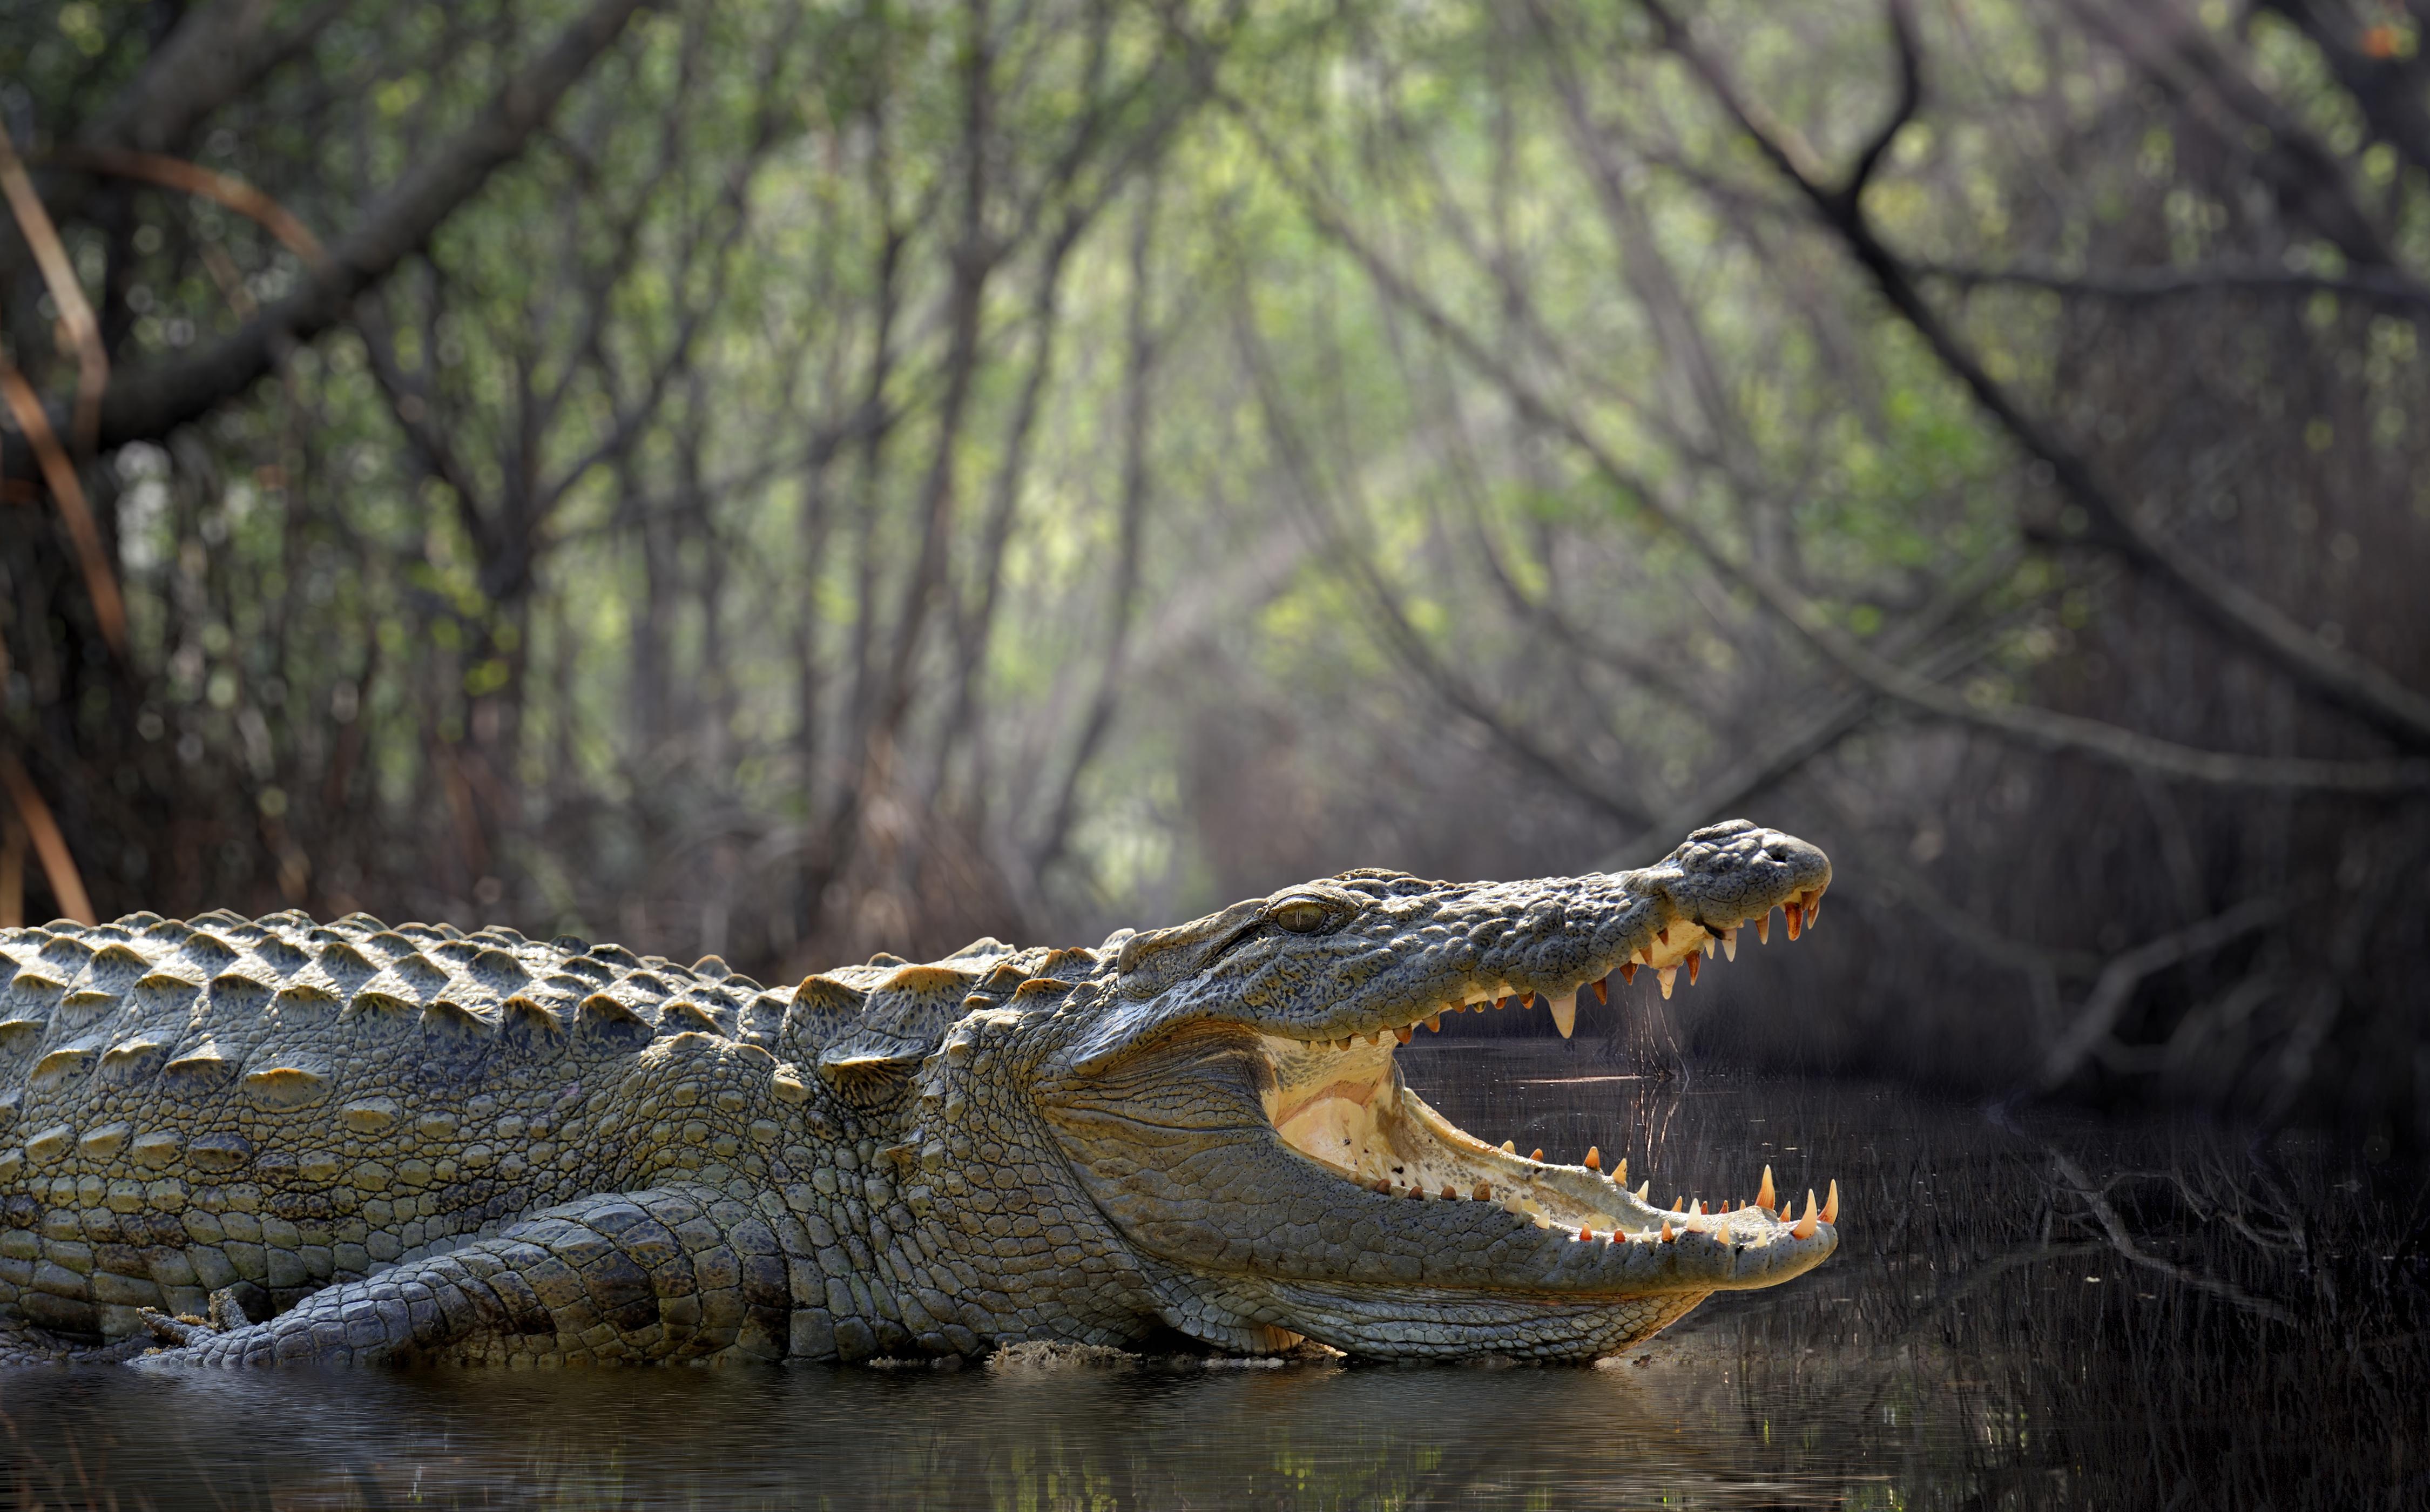 Crocodile Depth Of Field Wildlife Predator Animal 4500x2800